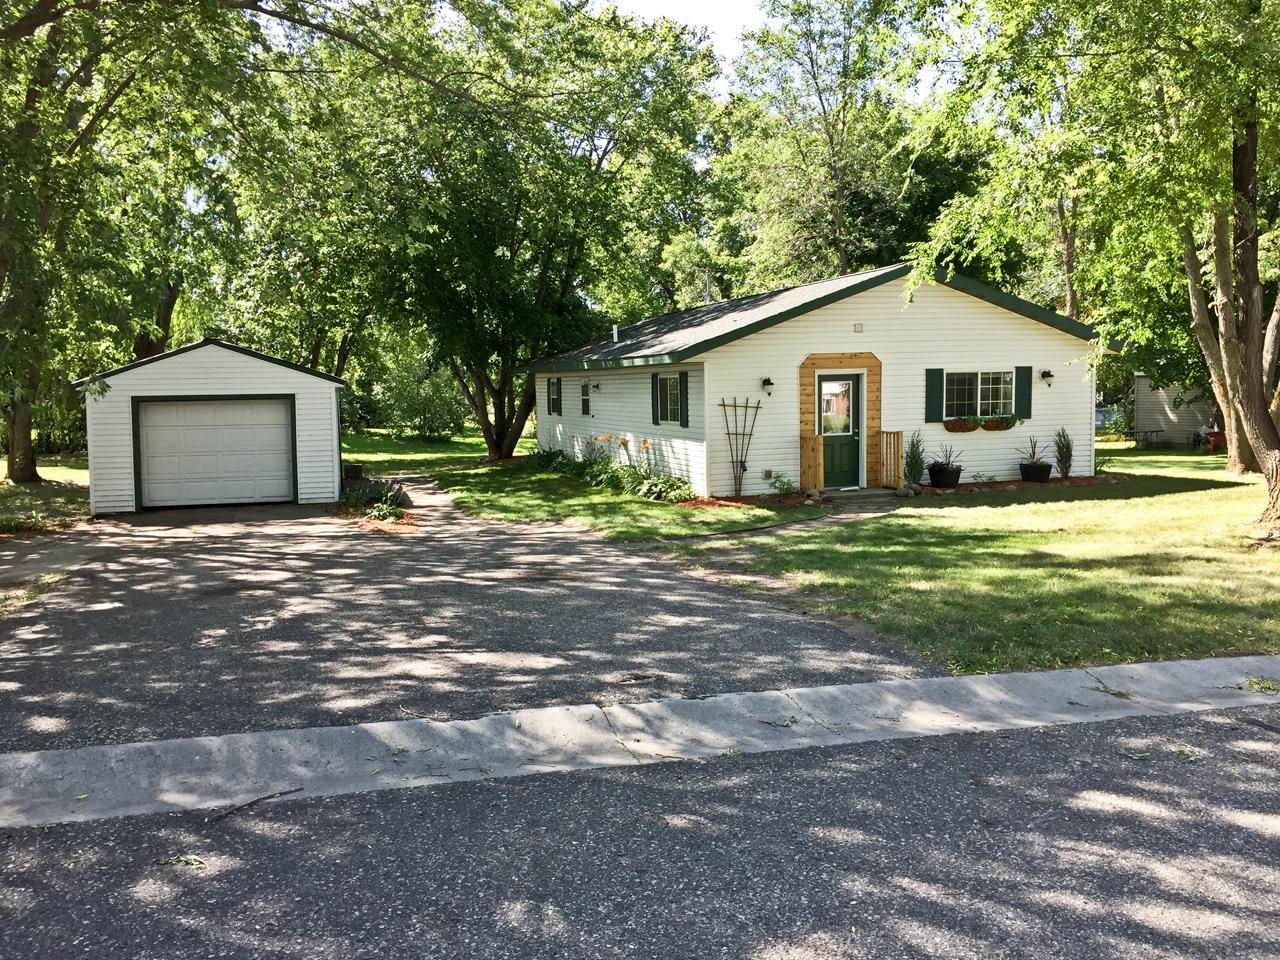 315 Muyers Ave, Carlos, Minnesota 56319